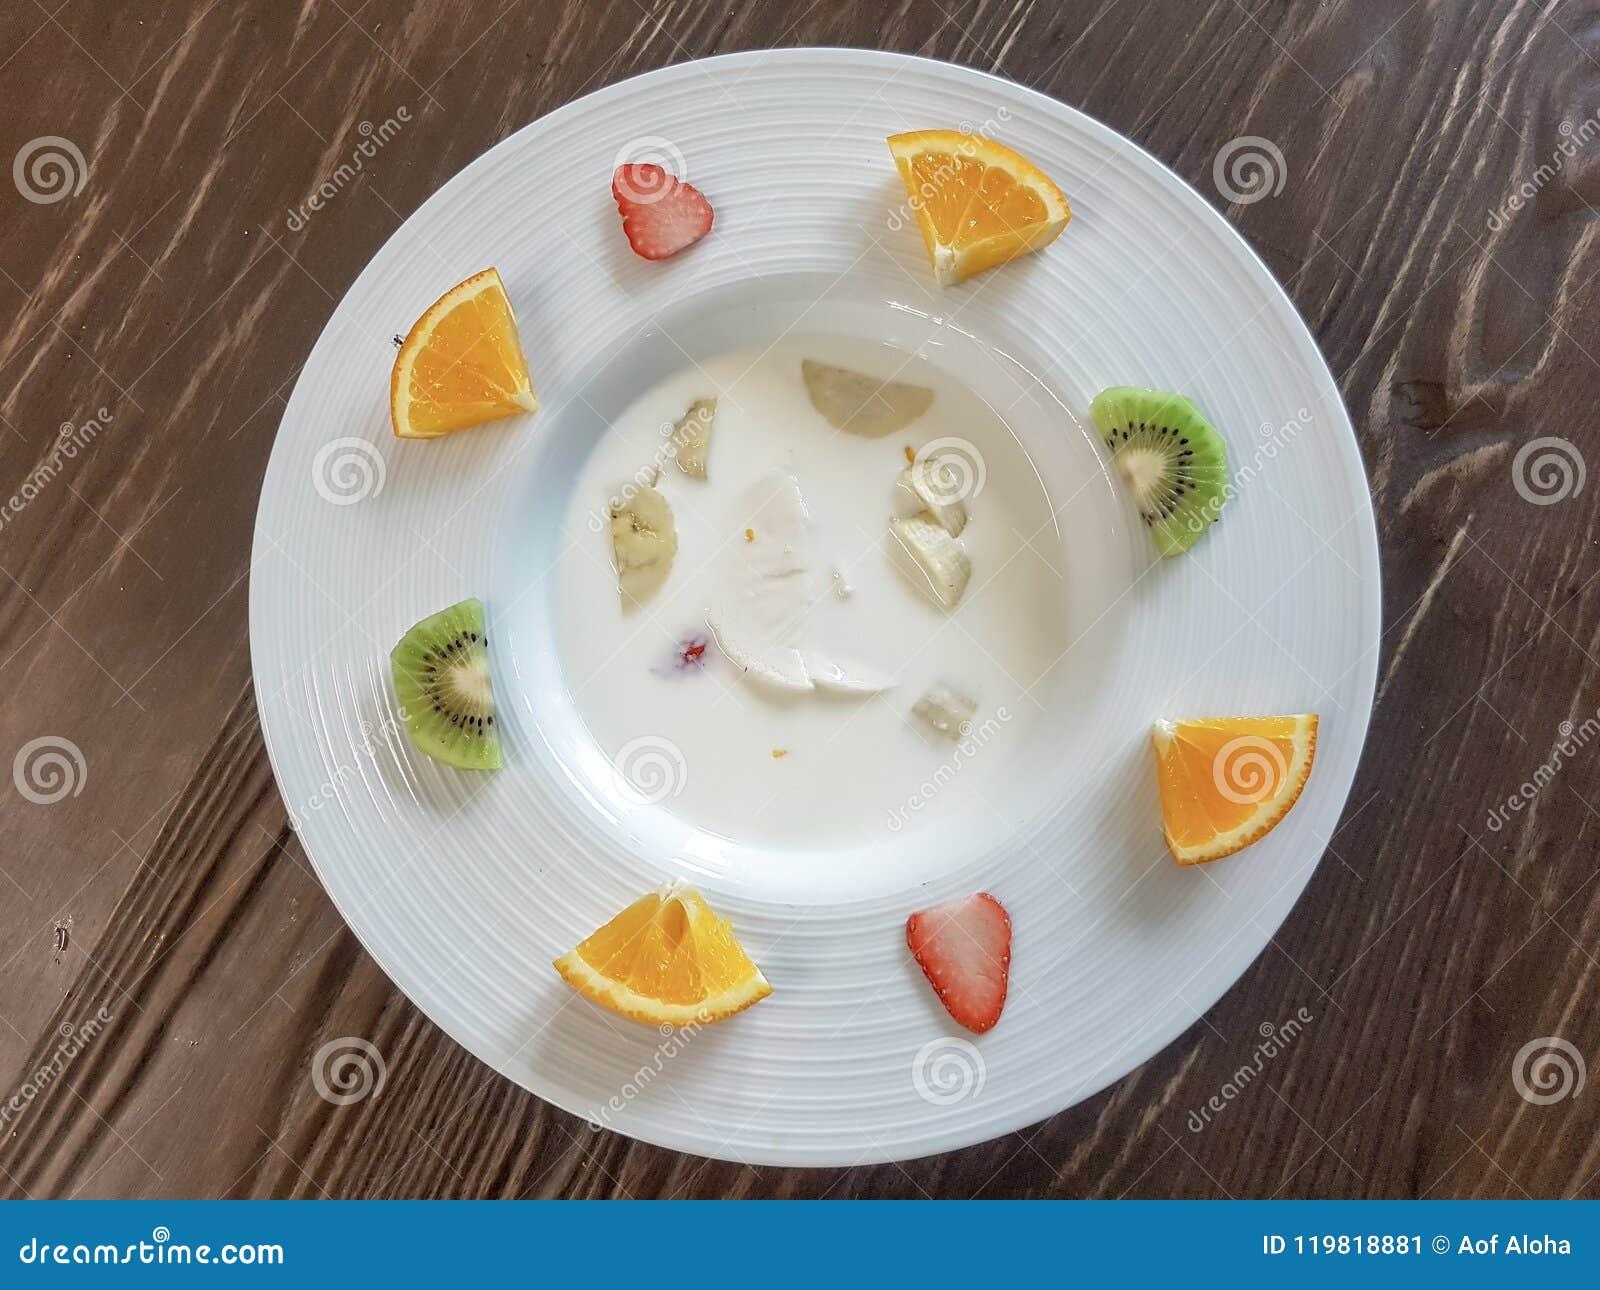 Milk Custard With Fruit Salad Stock Image Image Of Gourmet Lunch 119818881